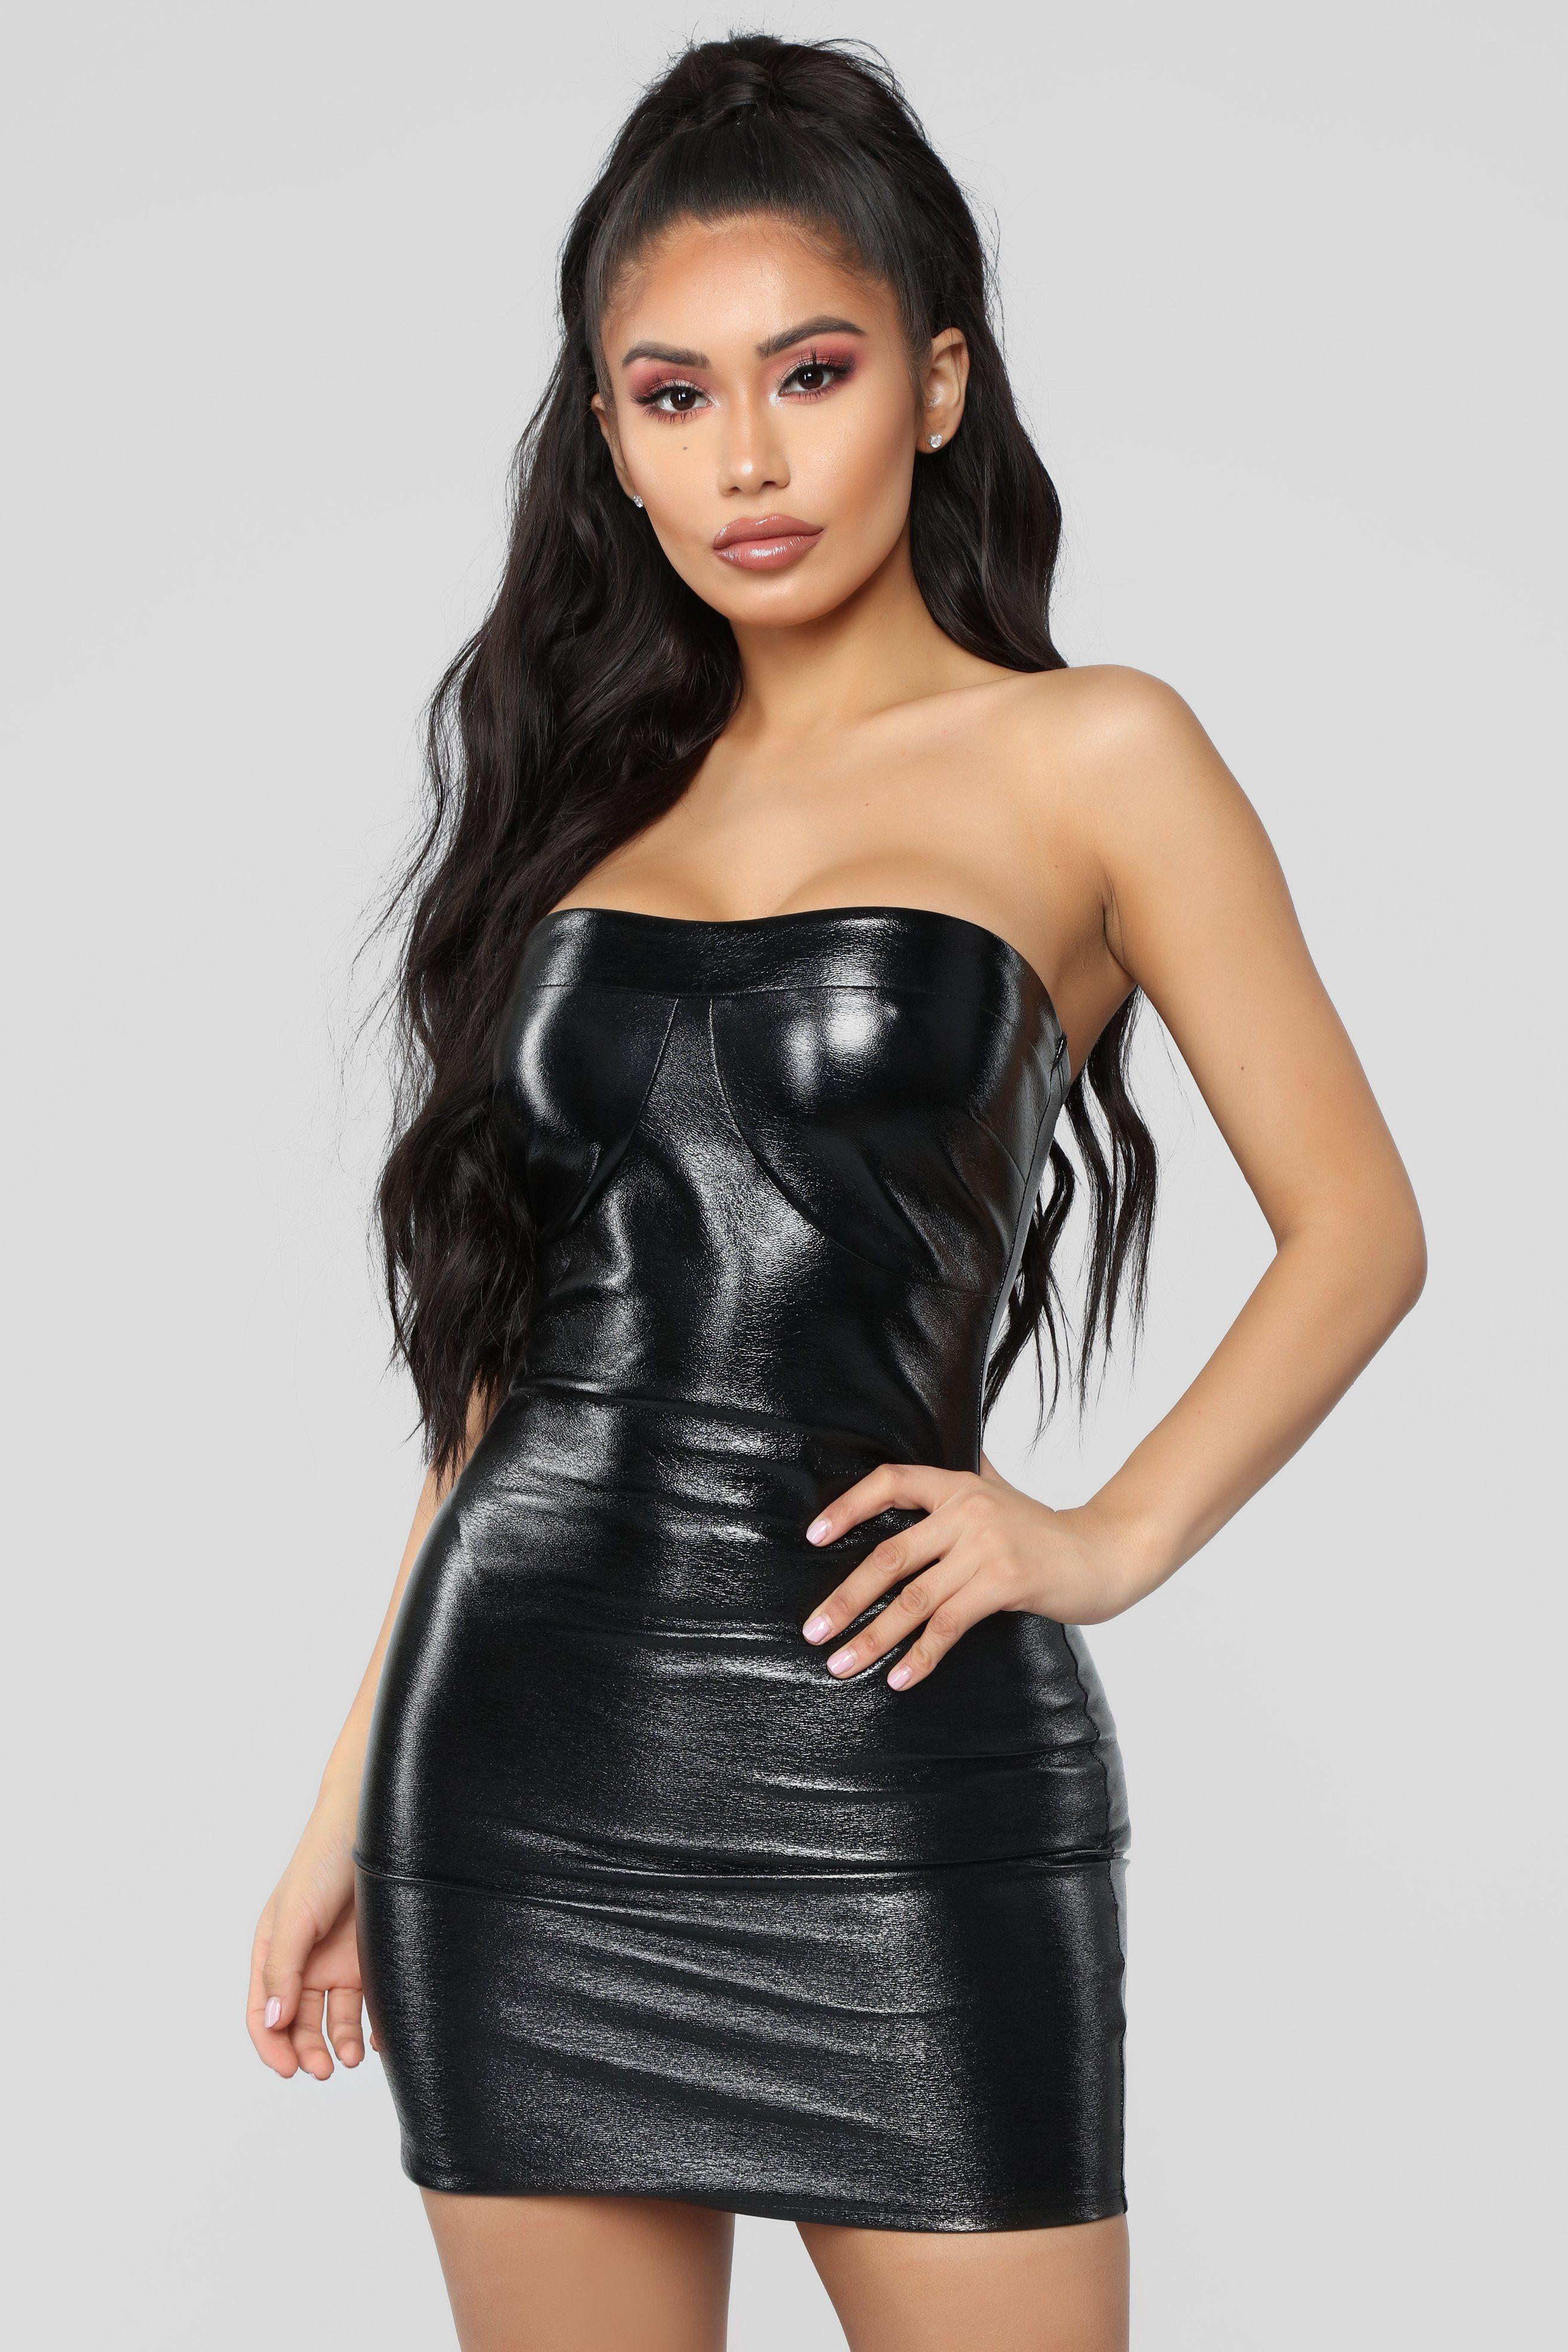 7e11377575 Baddies Only Mini Dress - Black